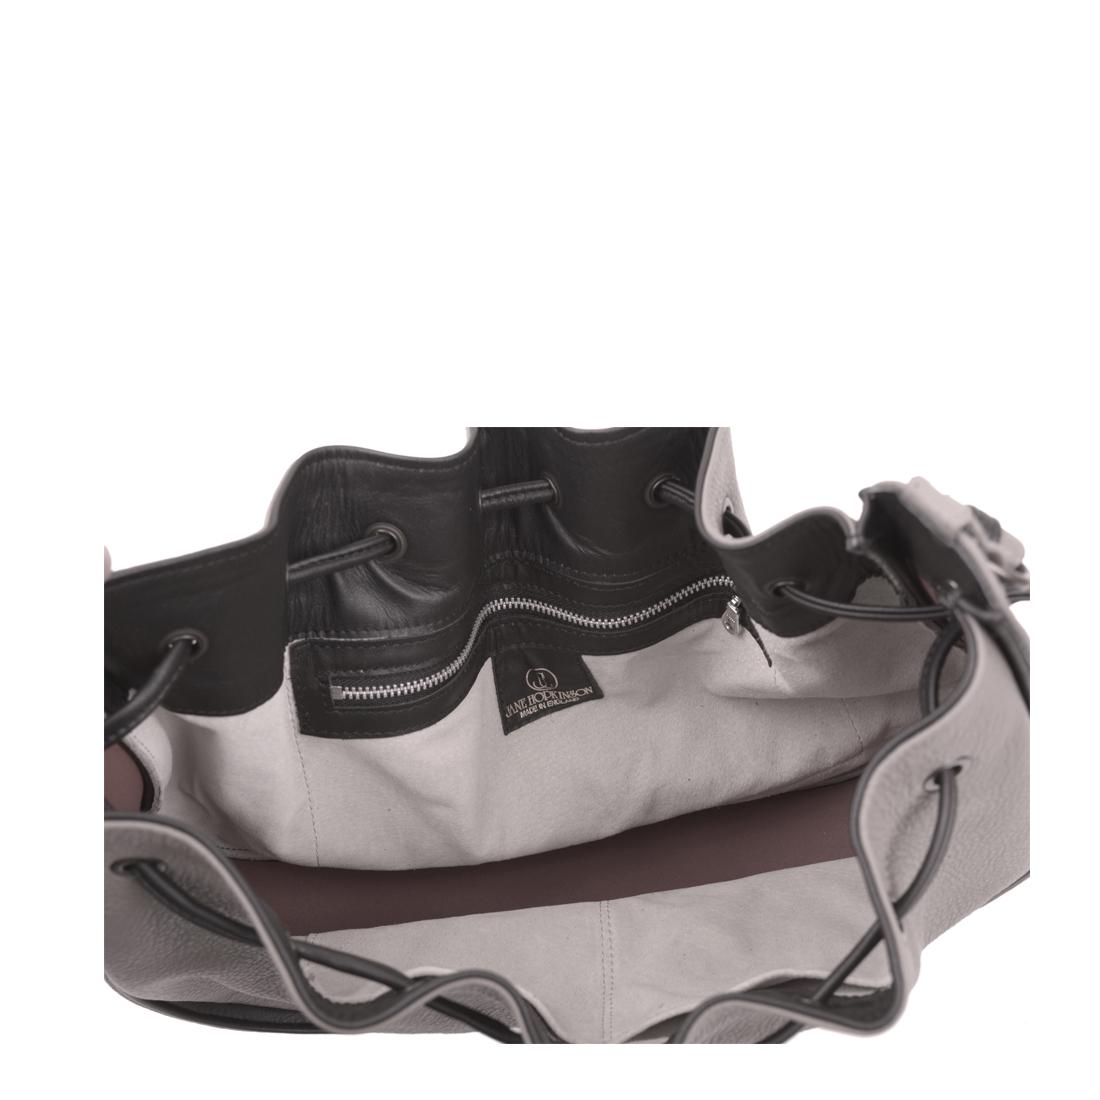 Daisy Taupe Black Leather Shoulder Bag